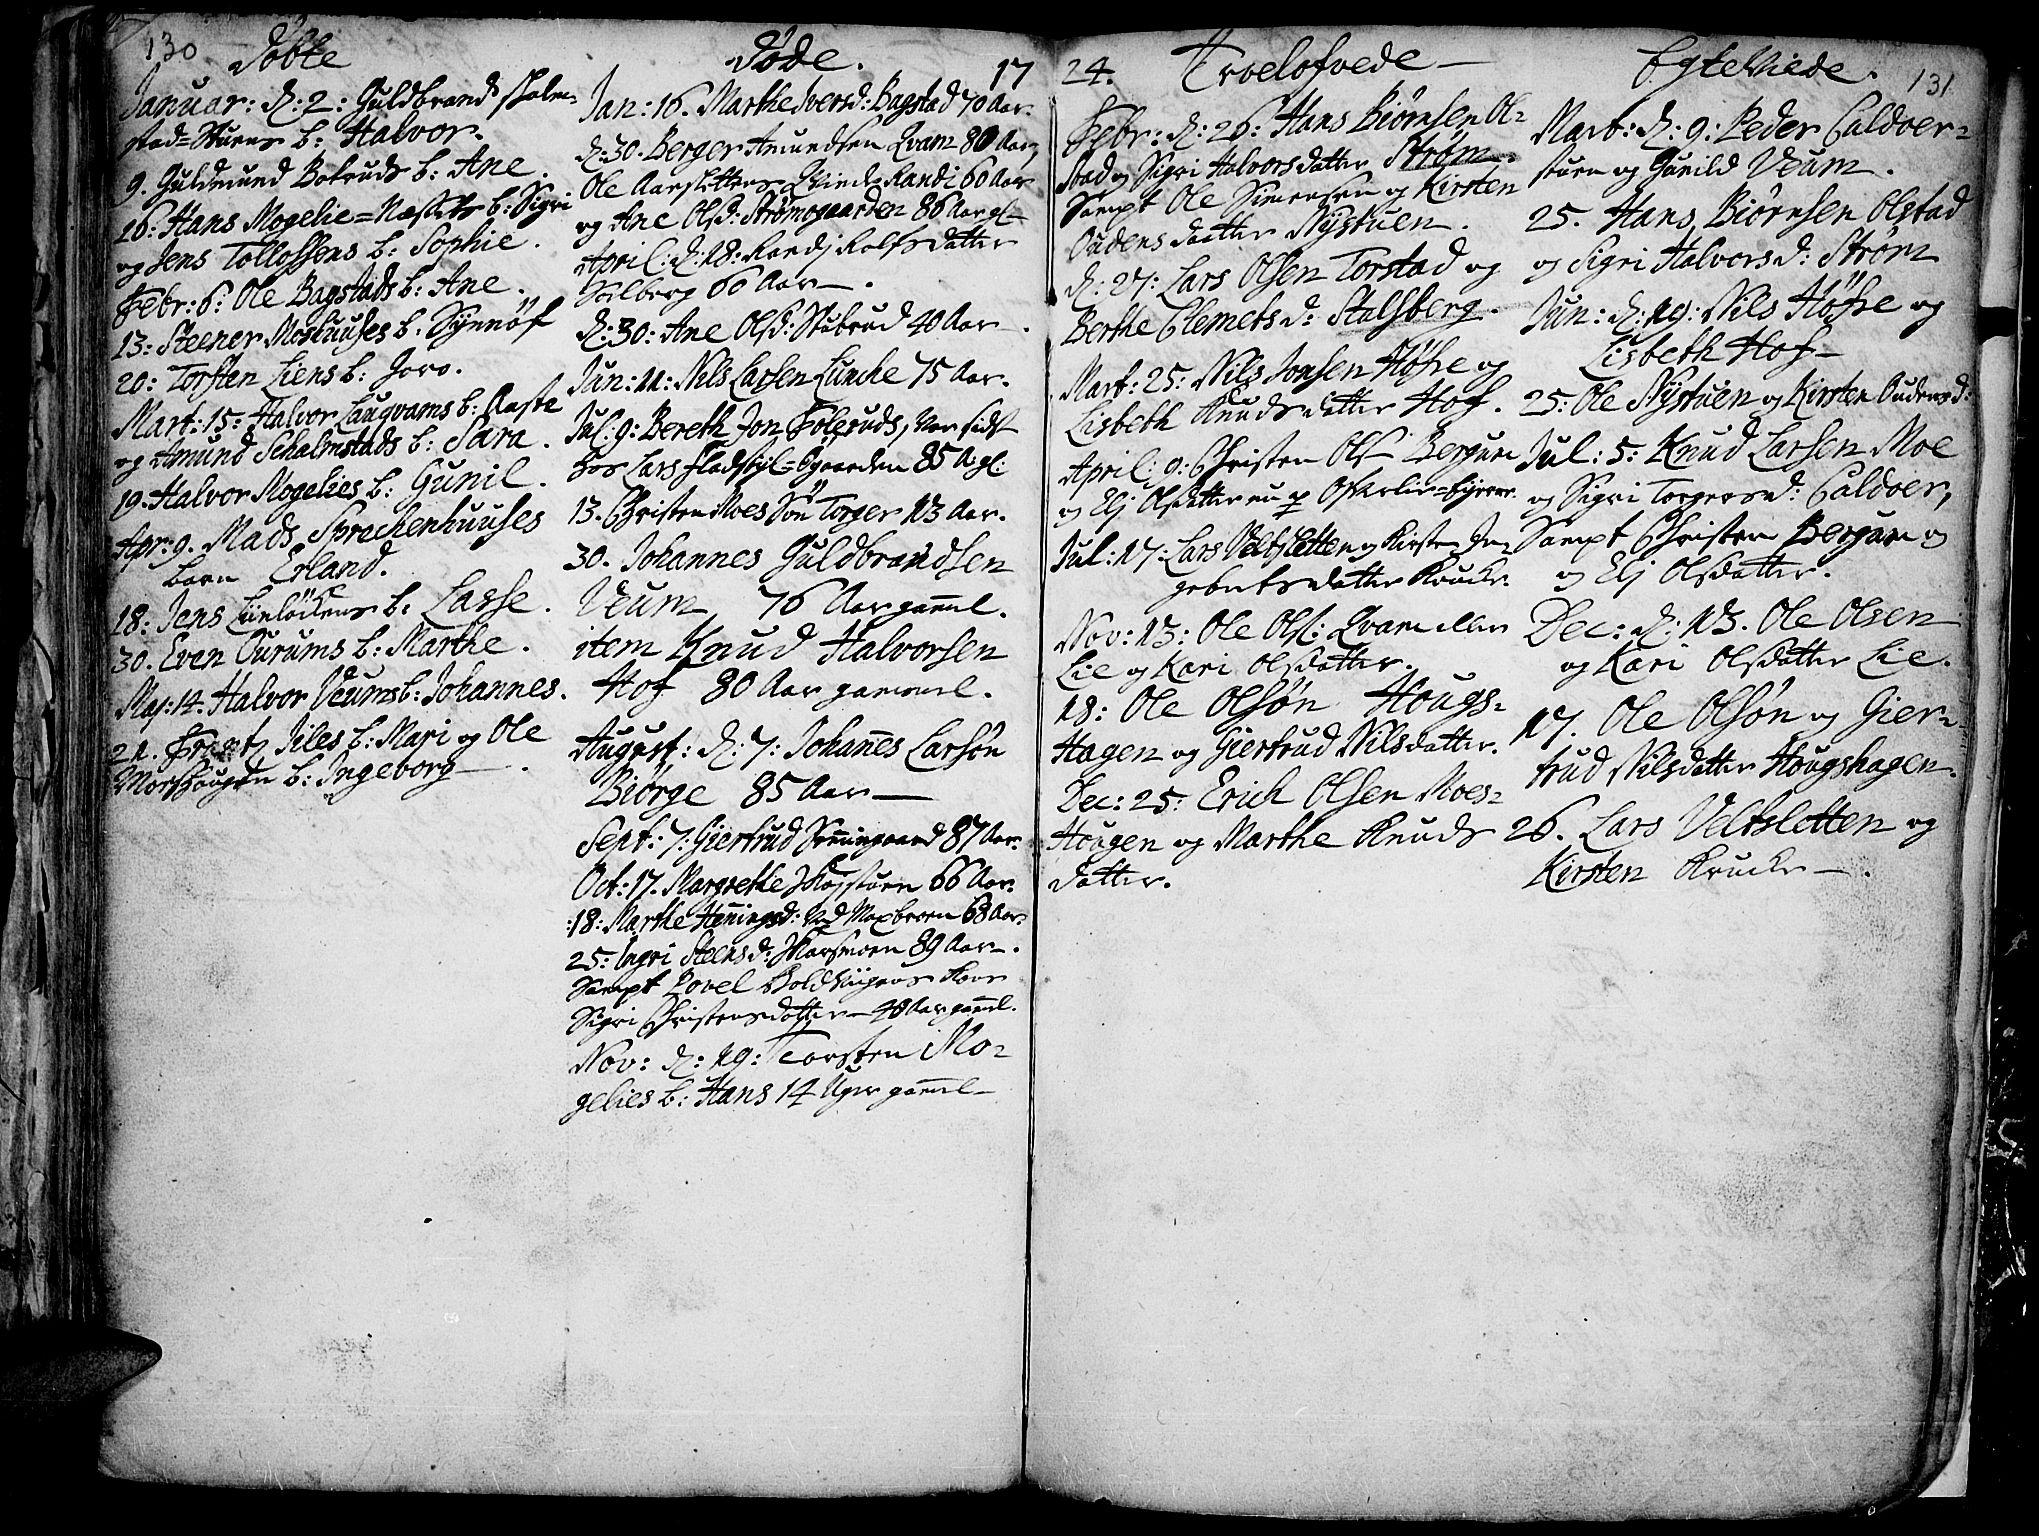 SAH, Øyer prestekontor, Ministerialbok nr. 1, 1671-1727, s. 130-131